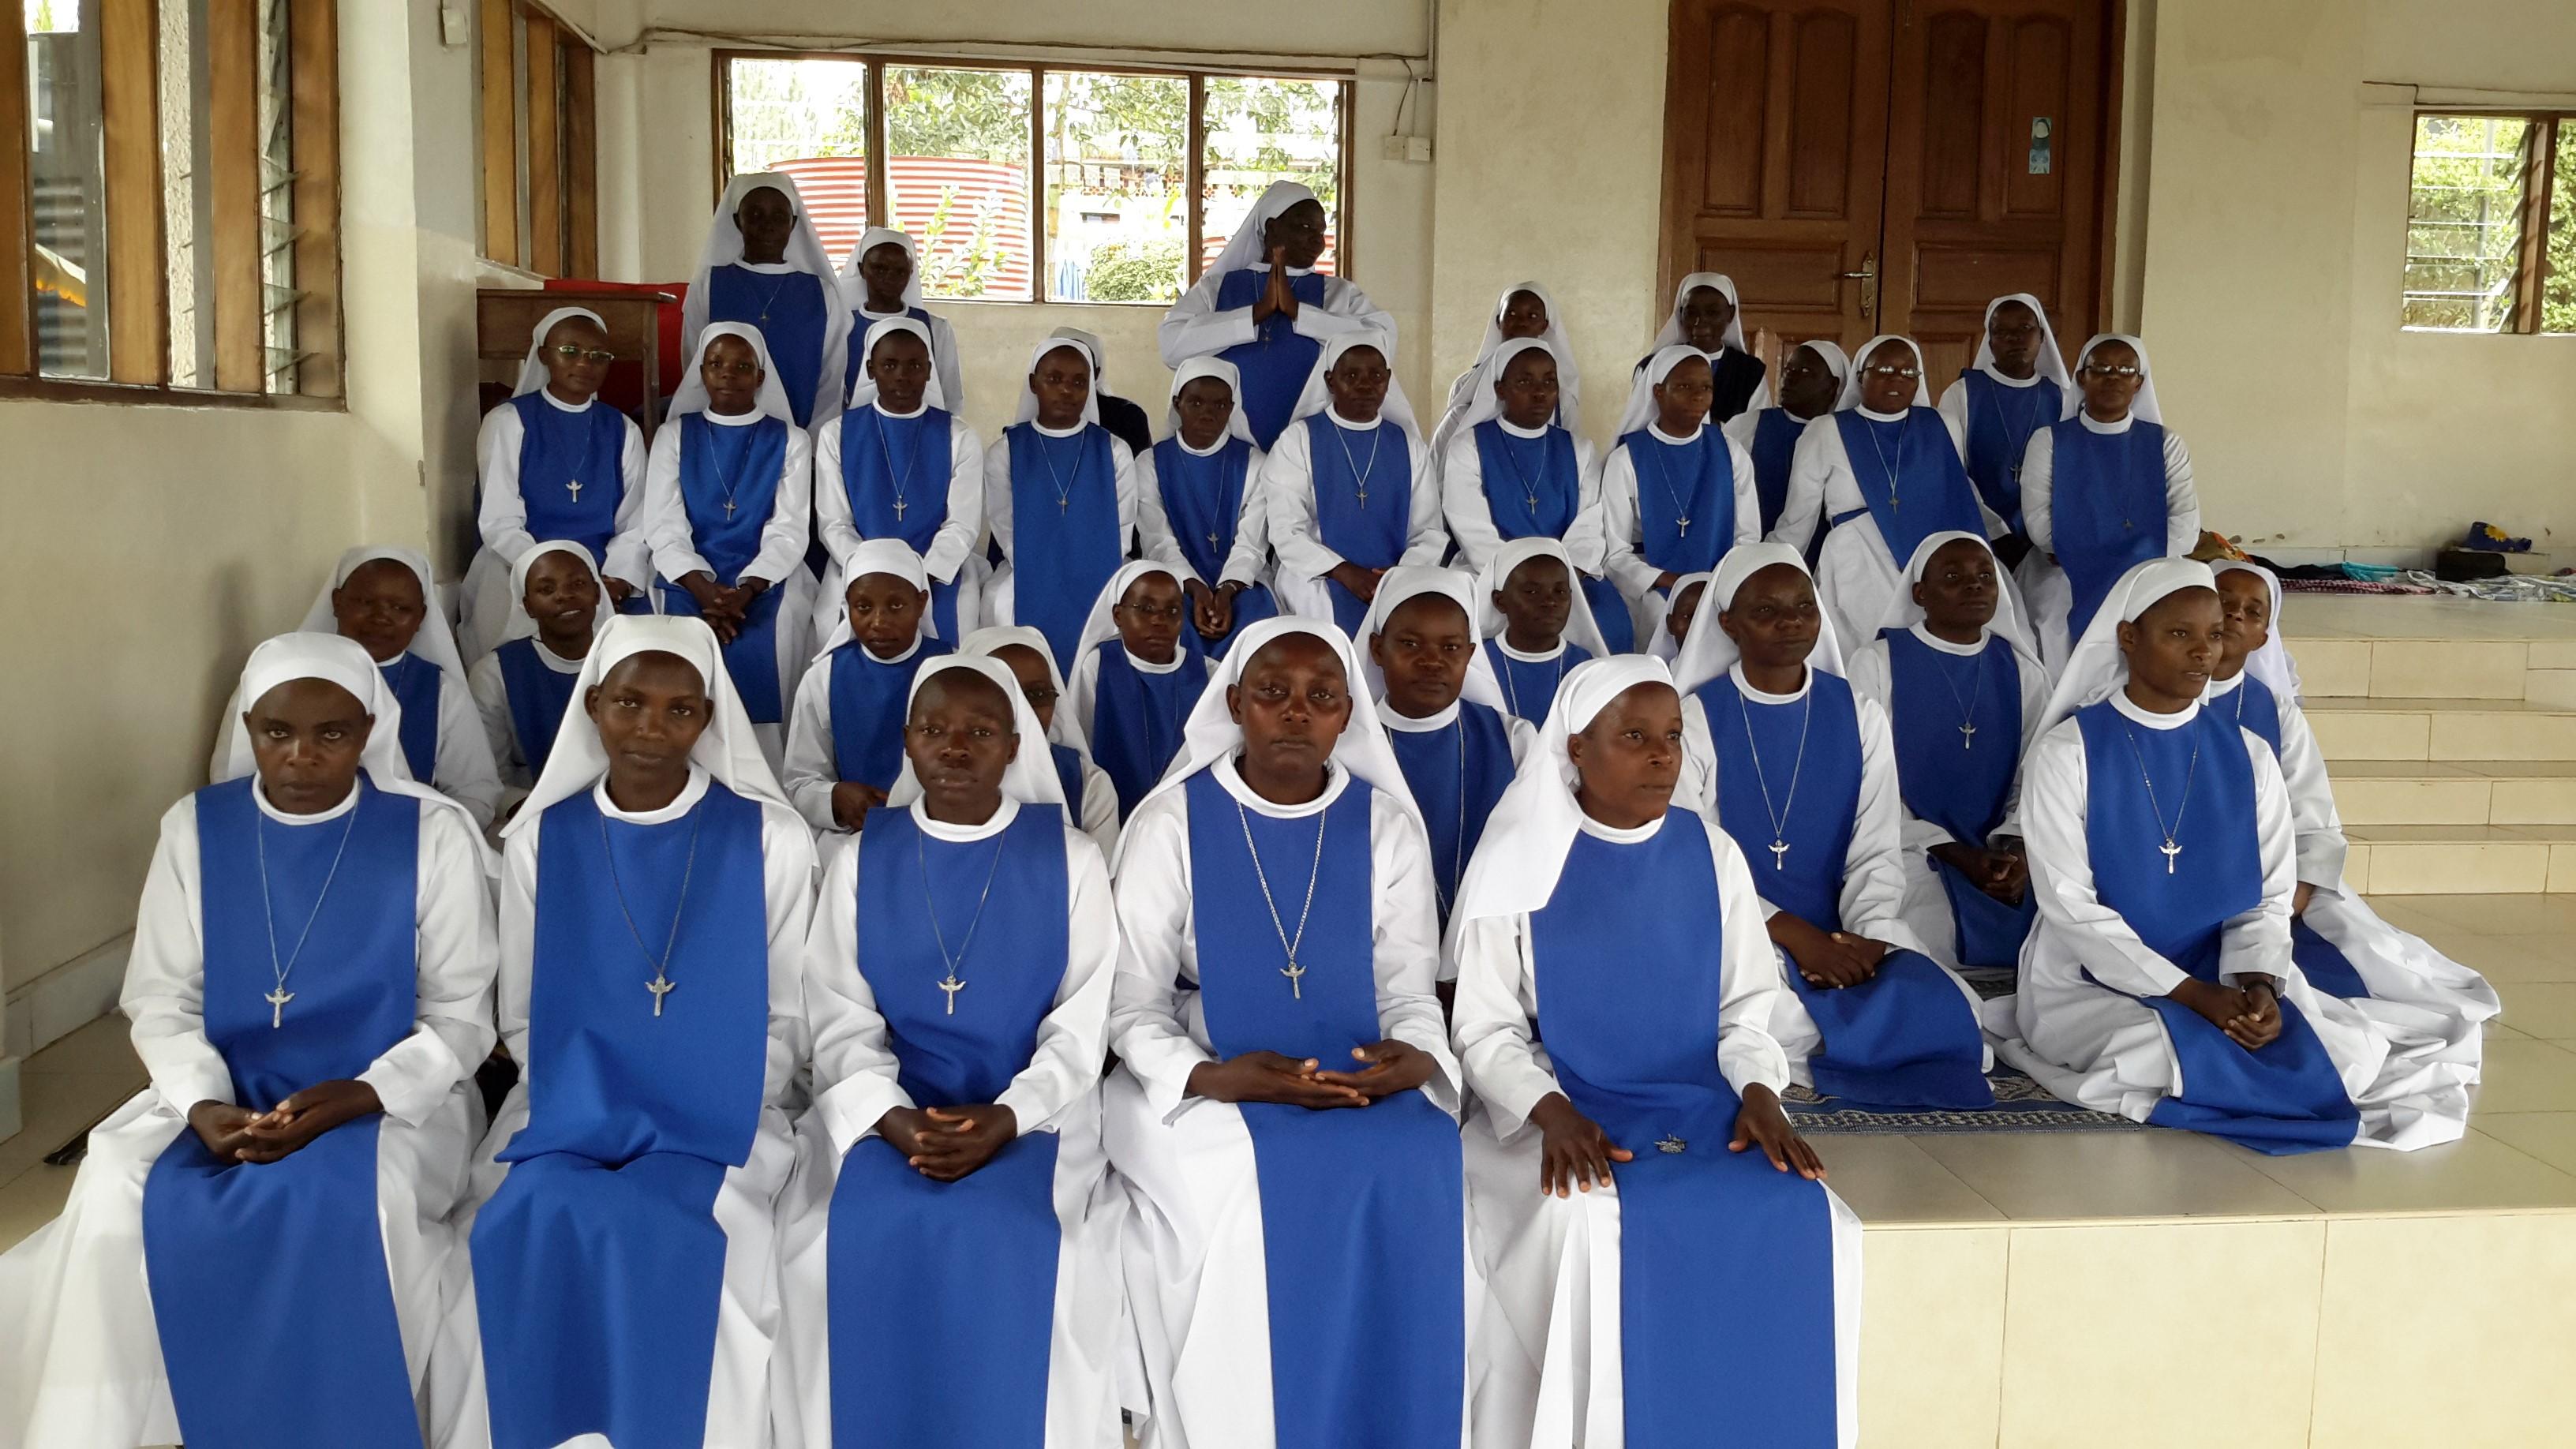 Brides of the Lamb GROUP.jpg